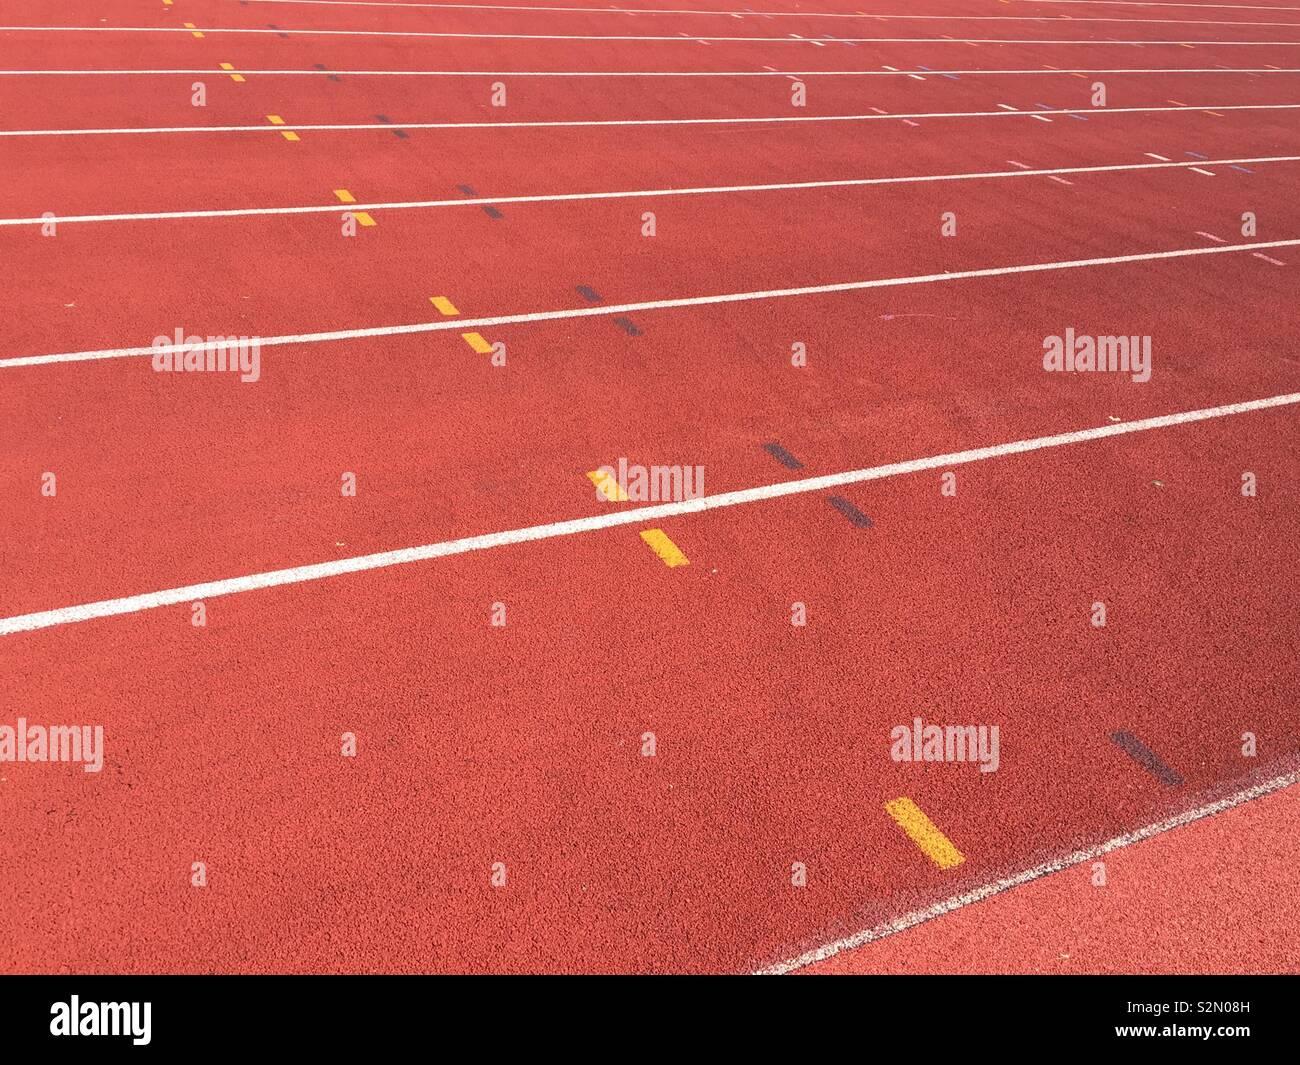 Sports athletics track - Stock Image